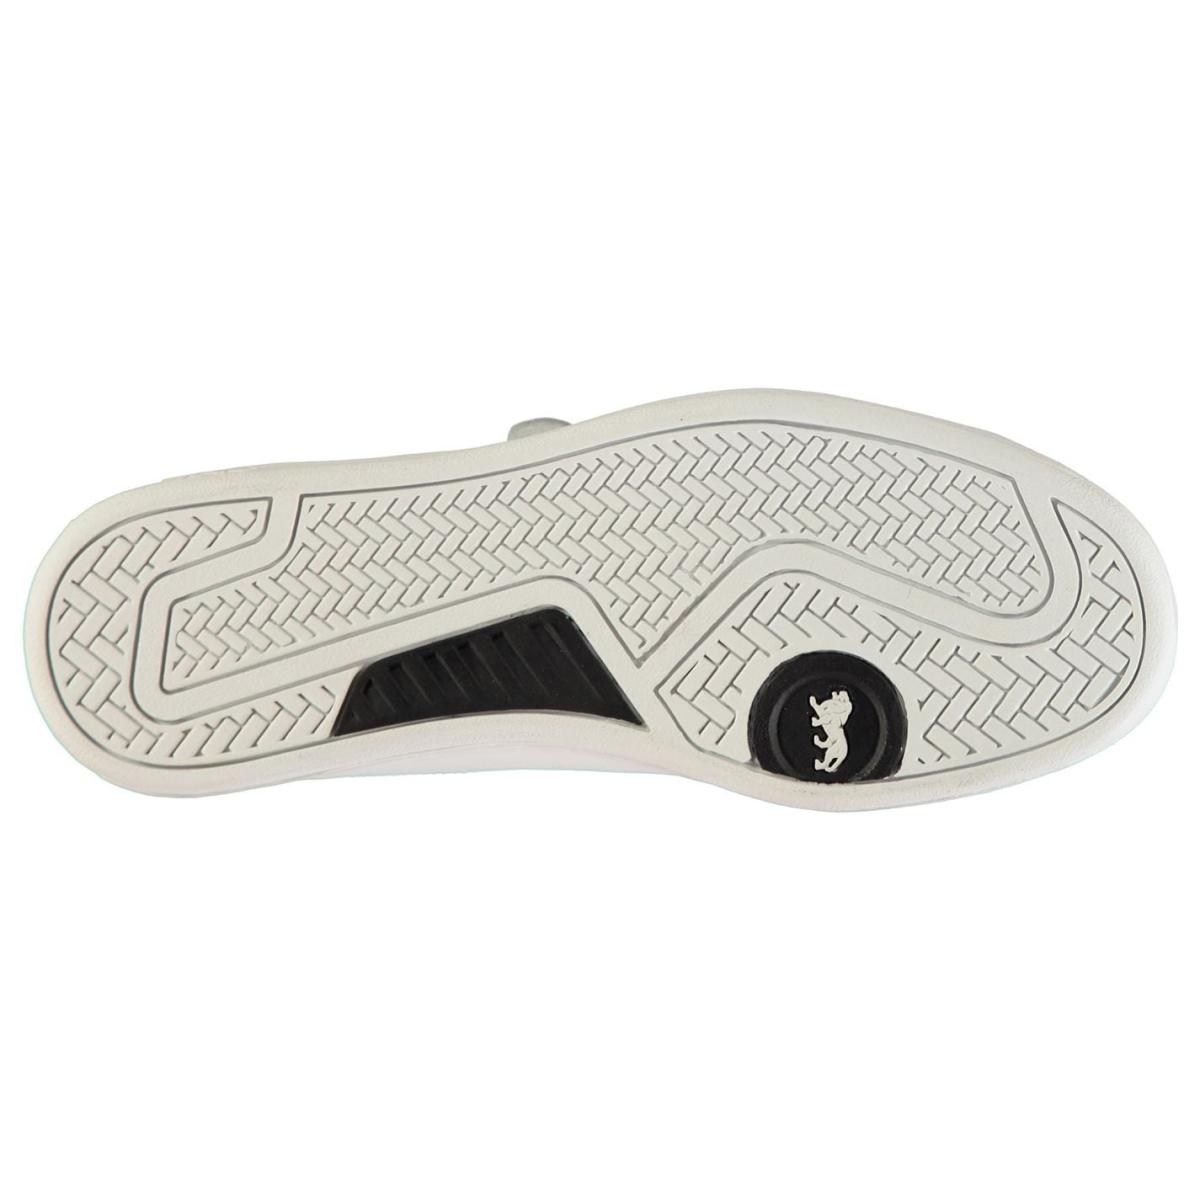 Lonsdale Herren Turnschuhe Sportschuhe Sneaker Laufschuhe Casual Leyton 5032